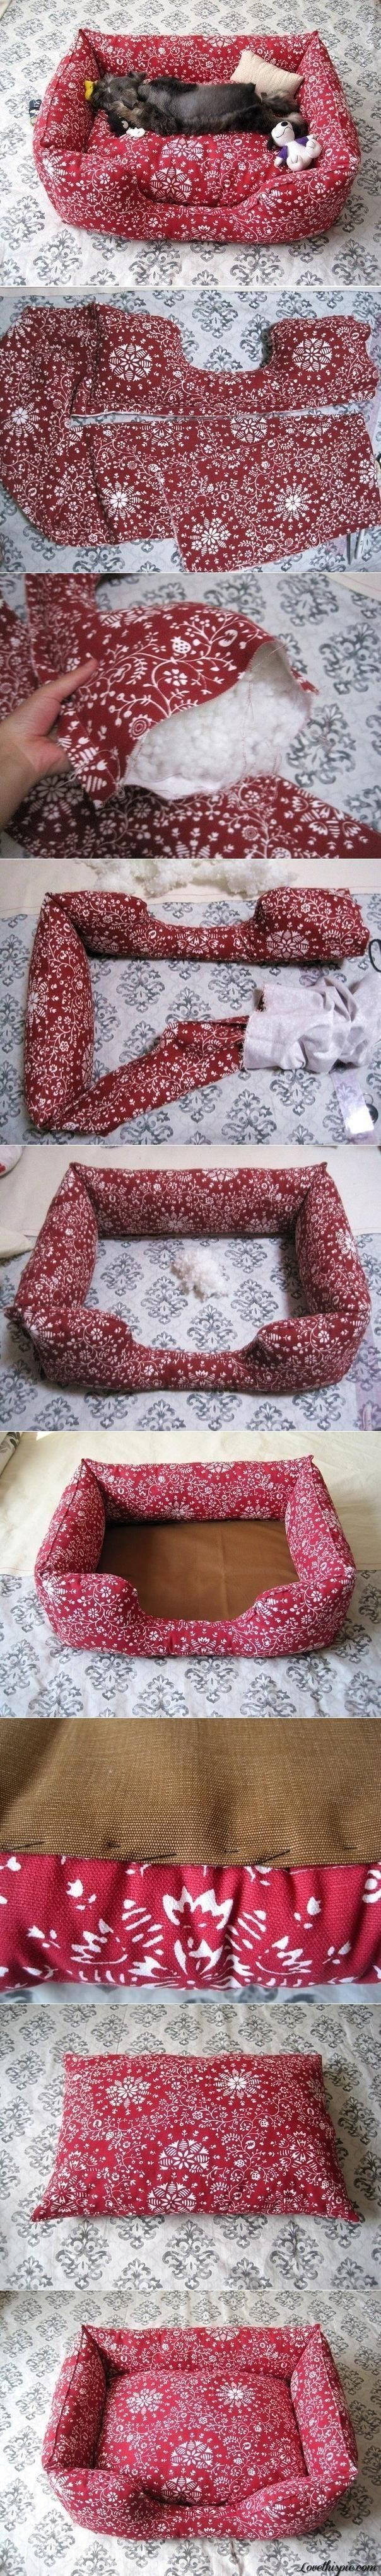 Cat/dog's bed - cama para gato o perro